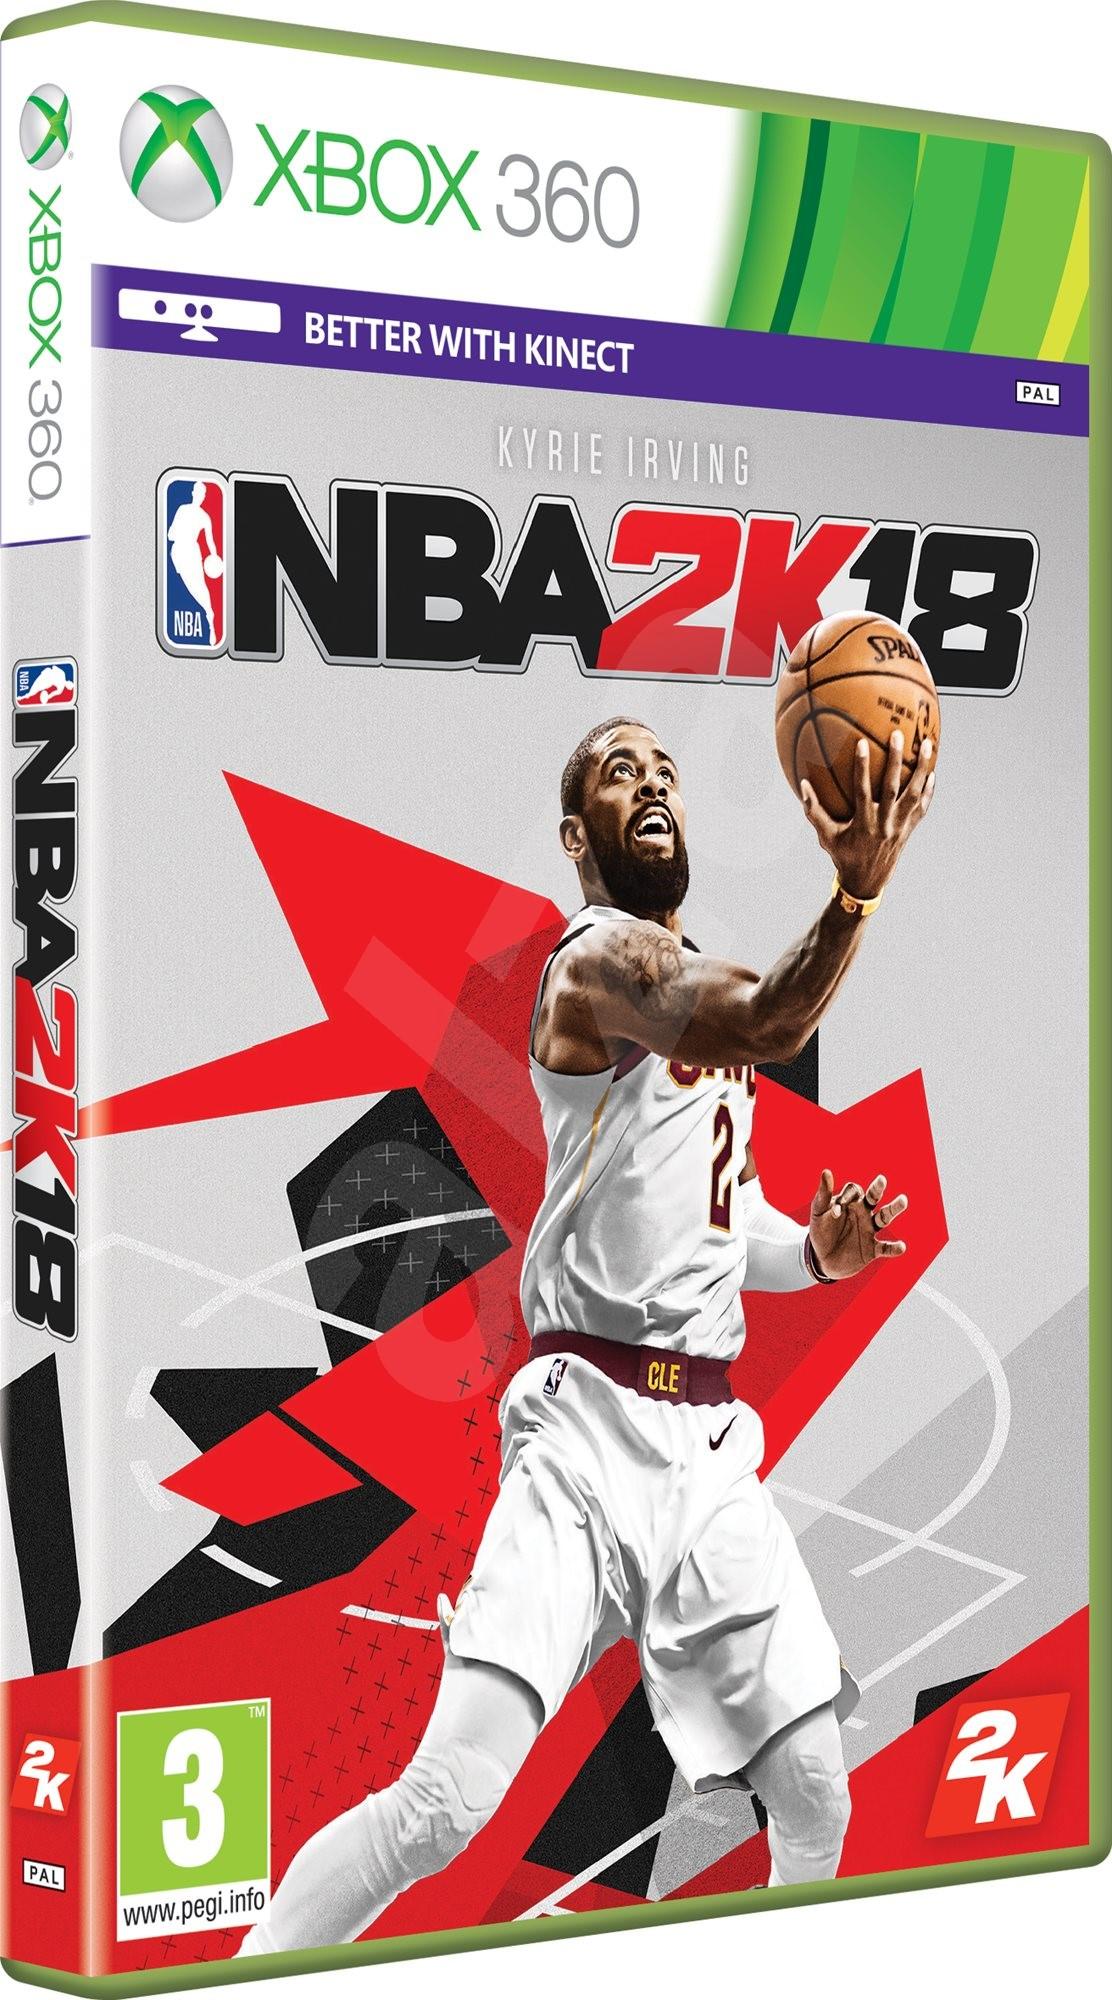 NBA 2K18 - Xbox 360 - Console Game | Alzashop.com